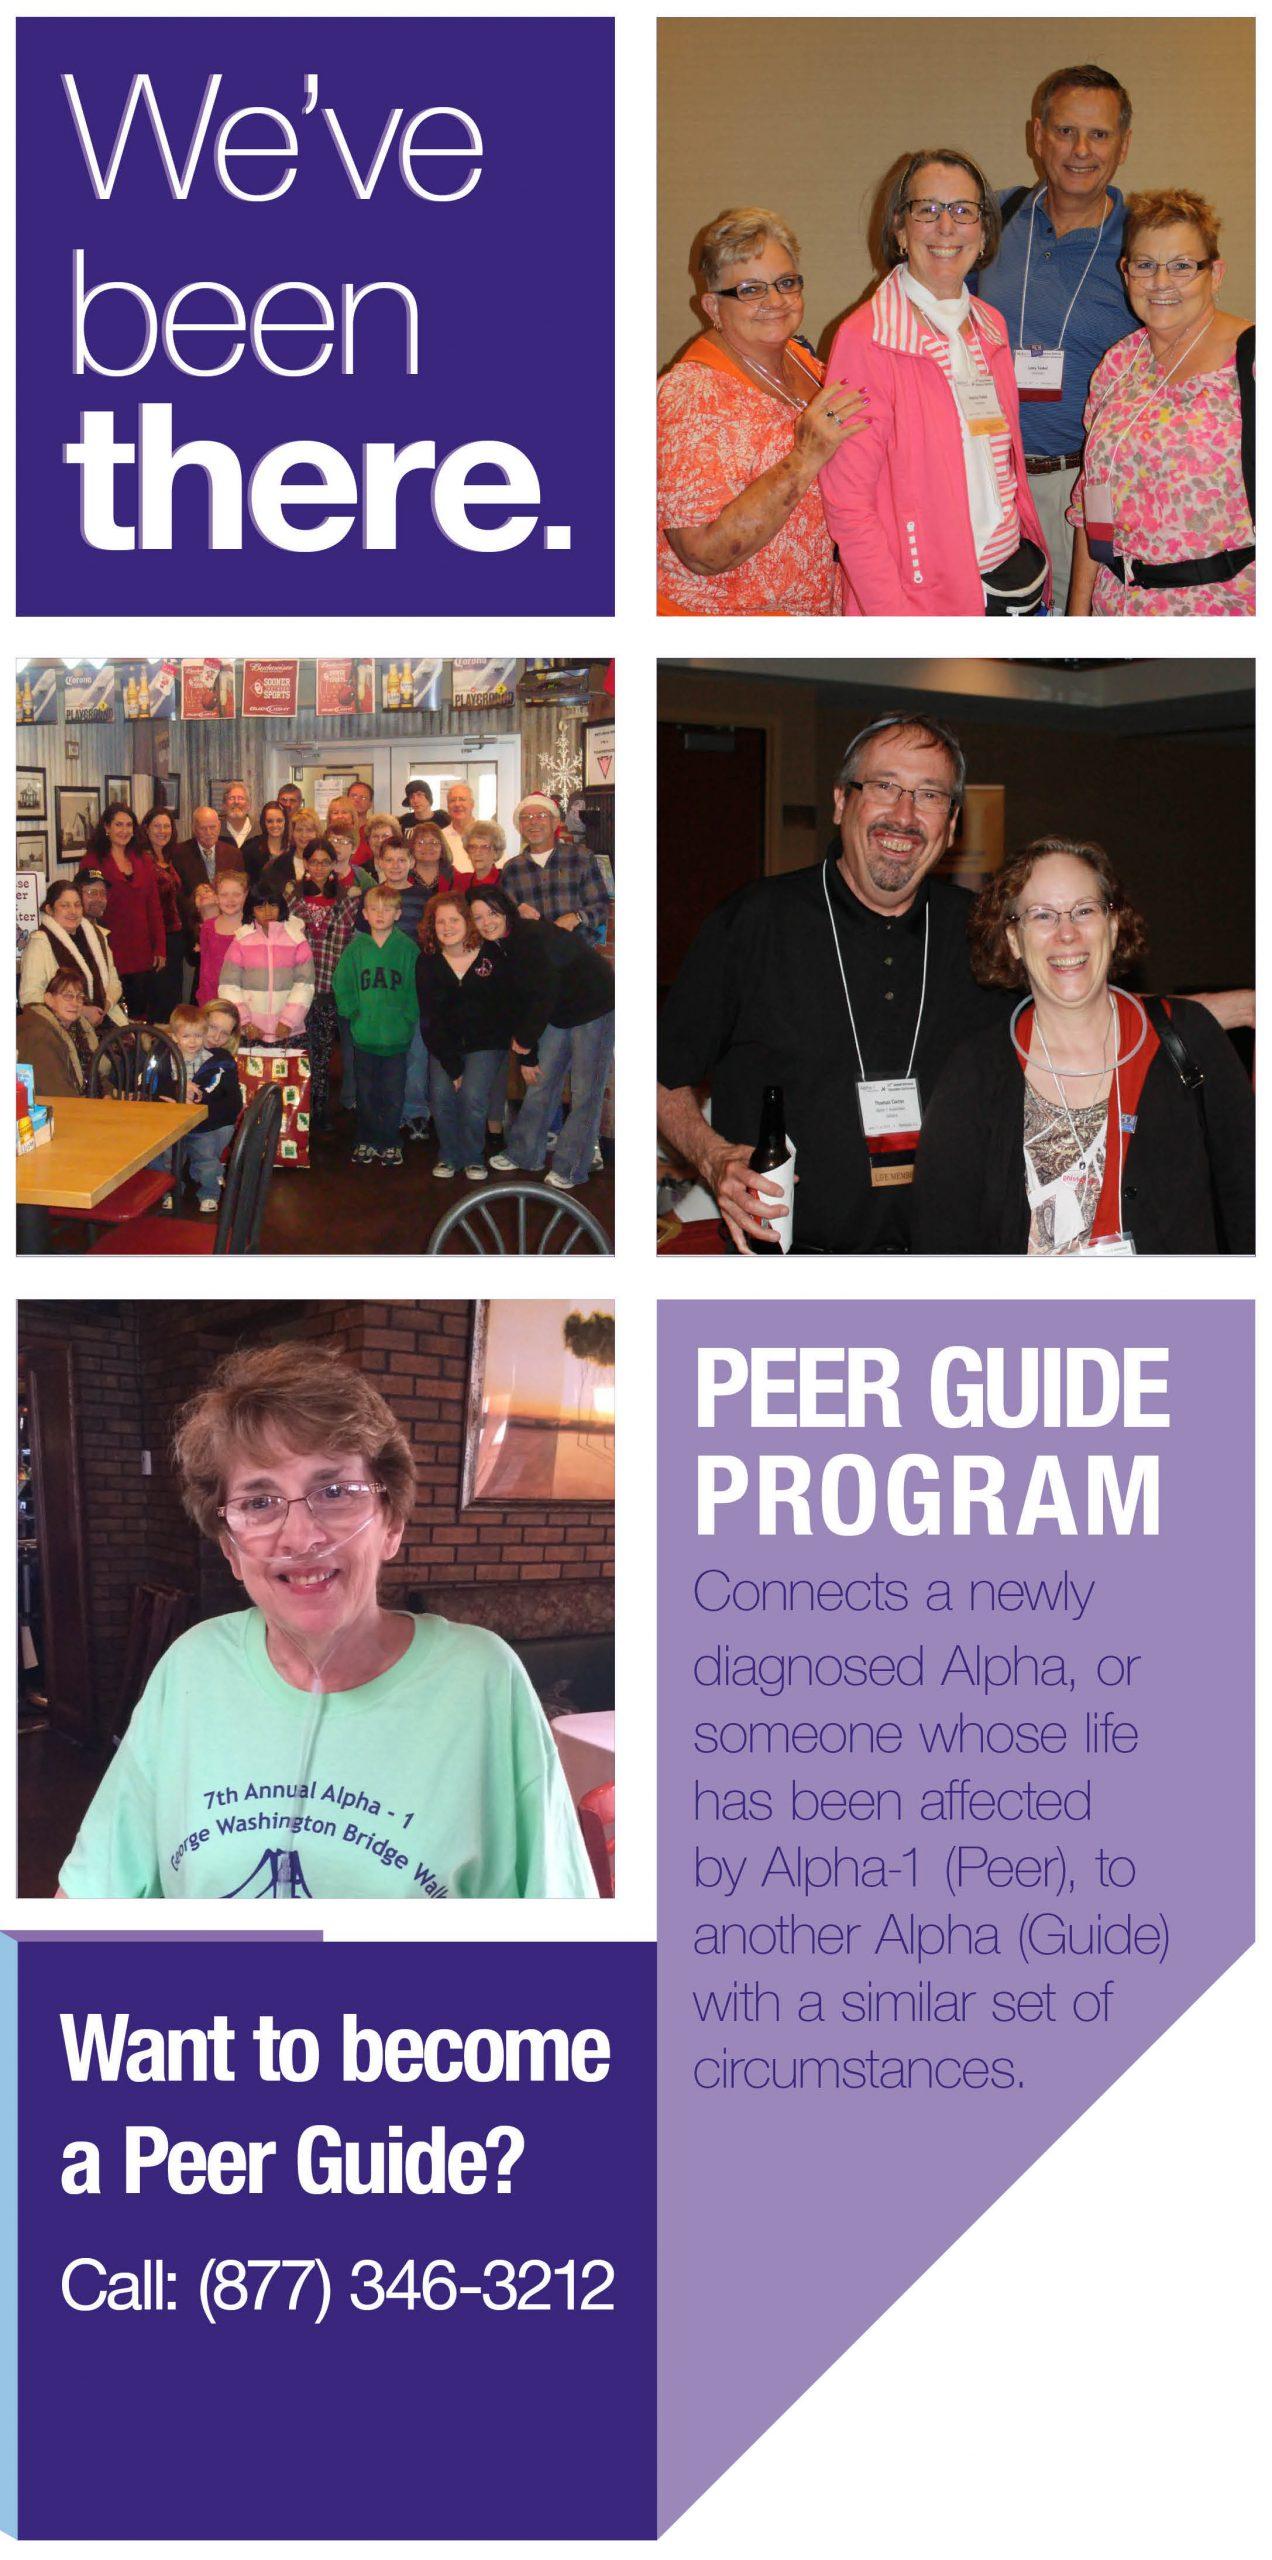 Peer Guides